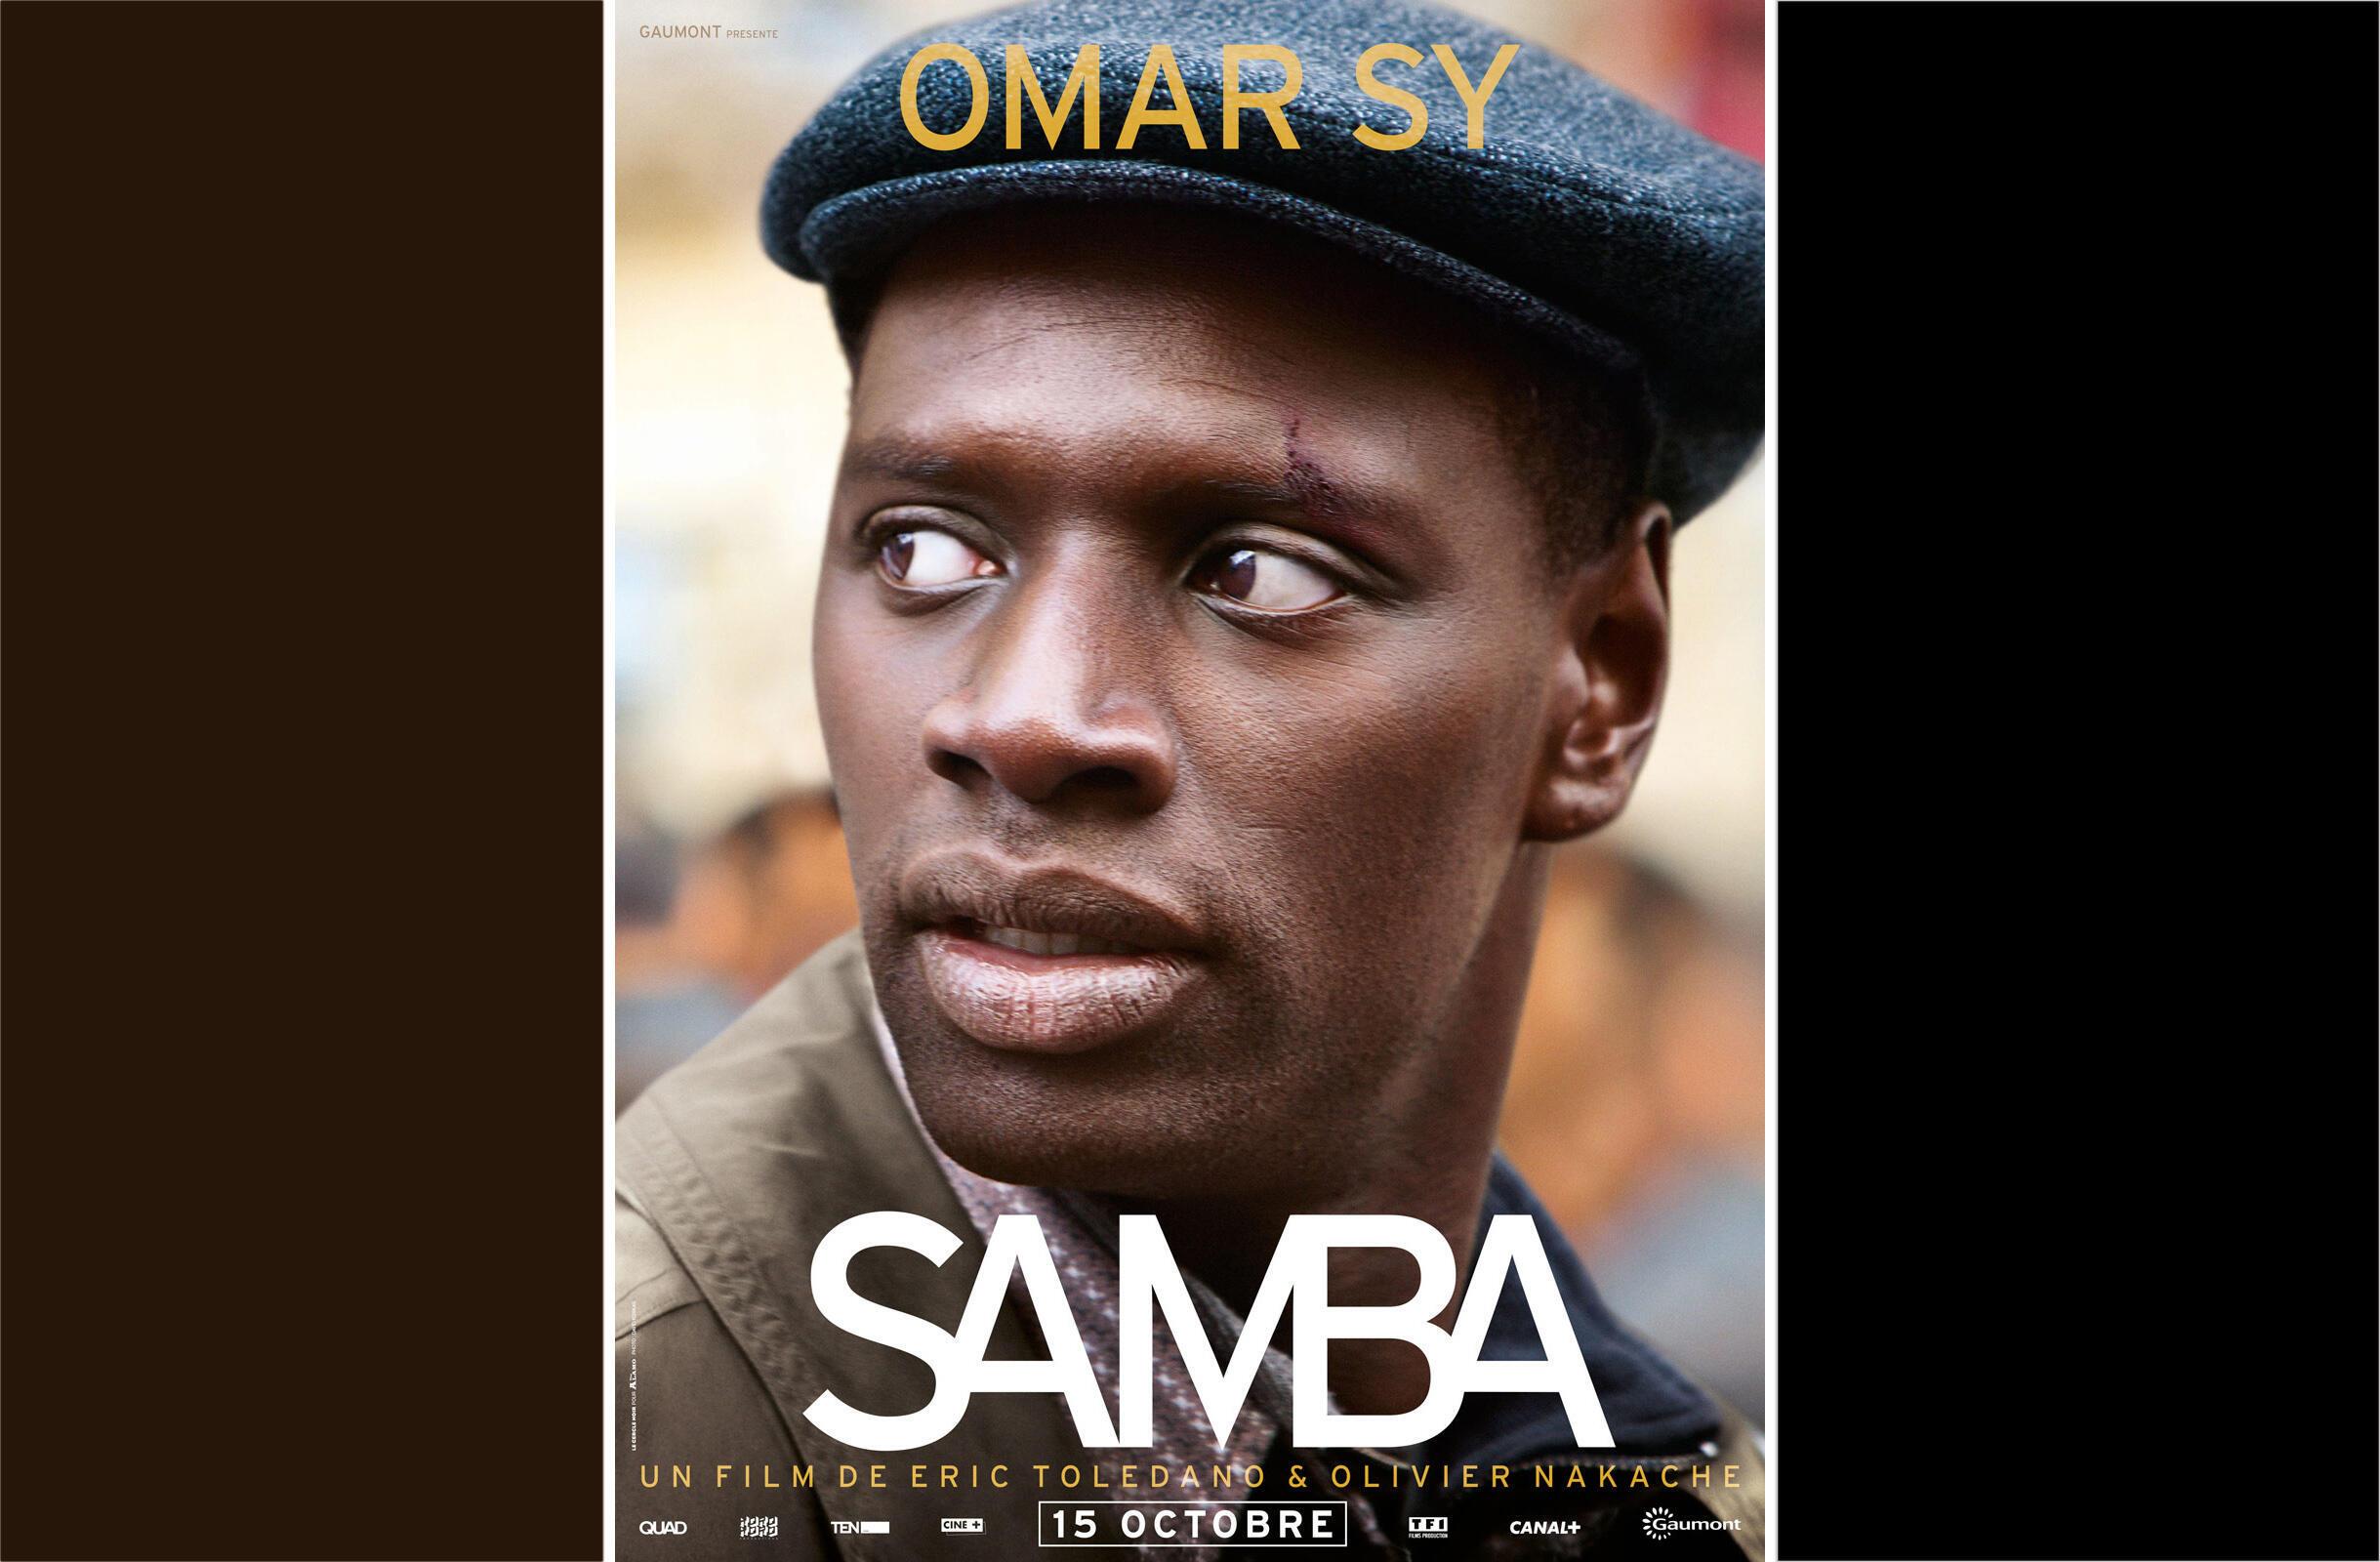 L'affiche du film <i>Samba, </i>des réalisateurs Olivier Nakache et Eric Toledano.